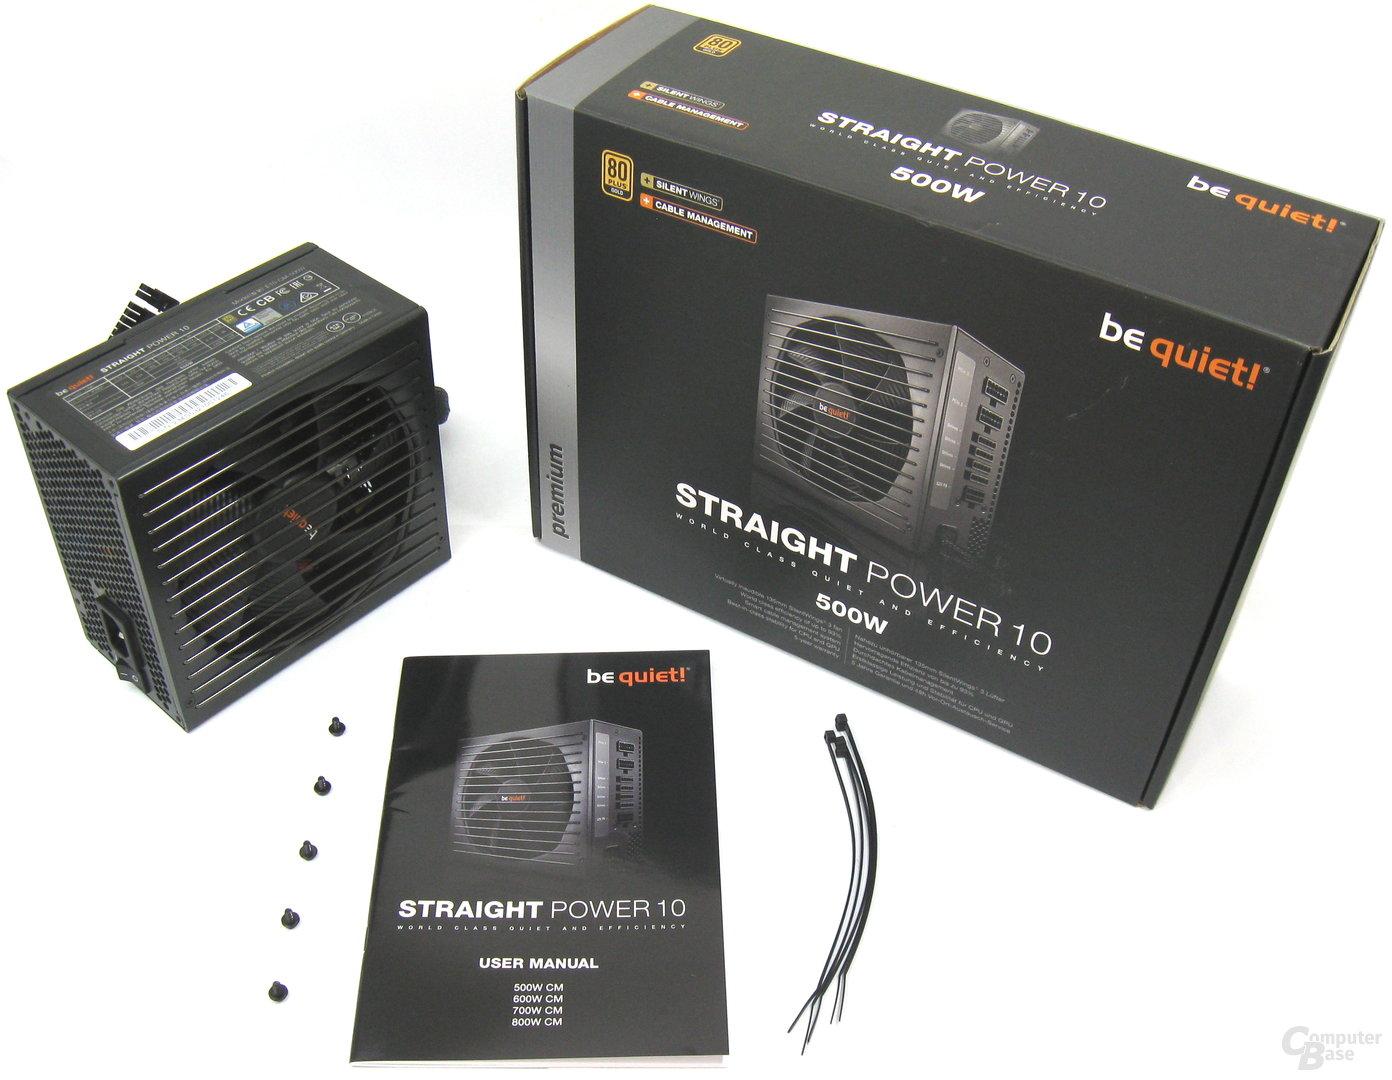 be quiet! Straight Power E10 500W CM